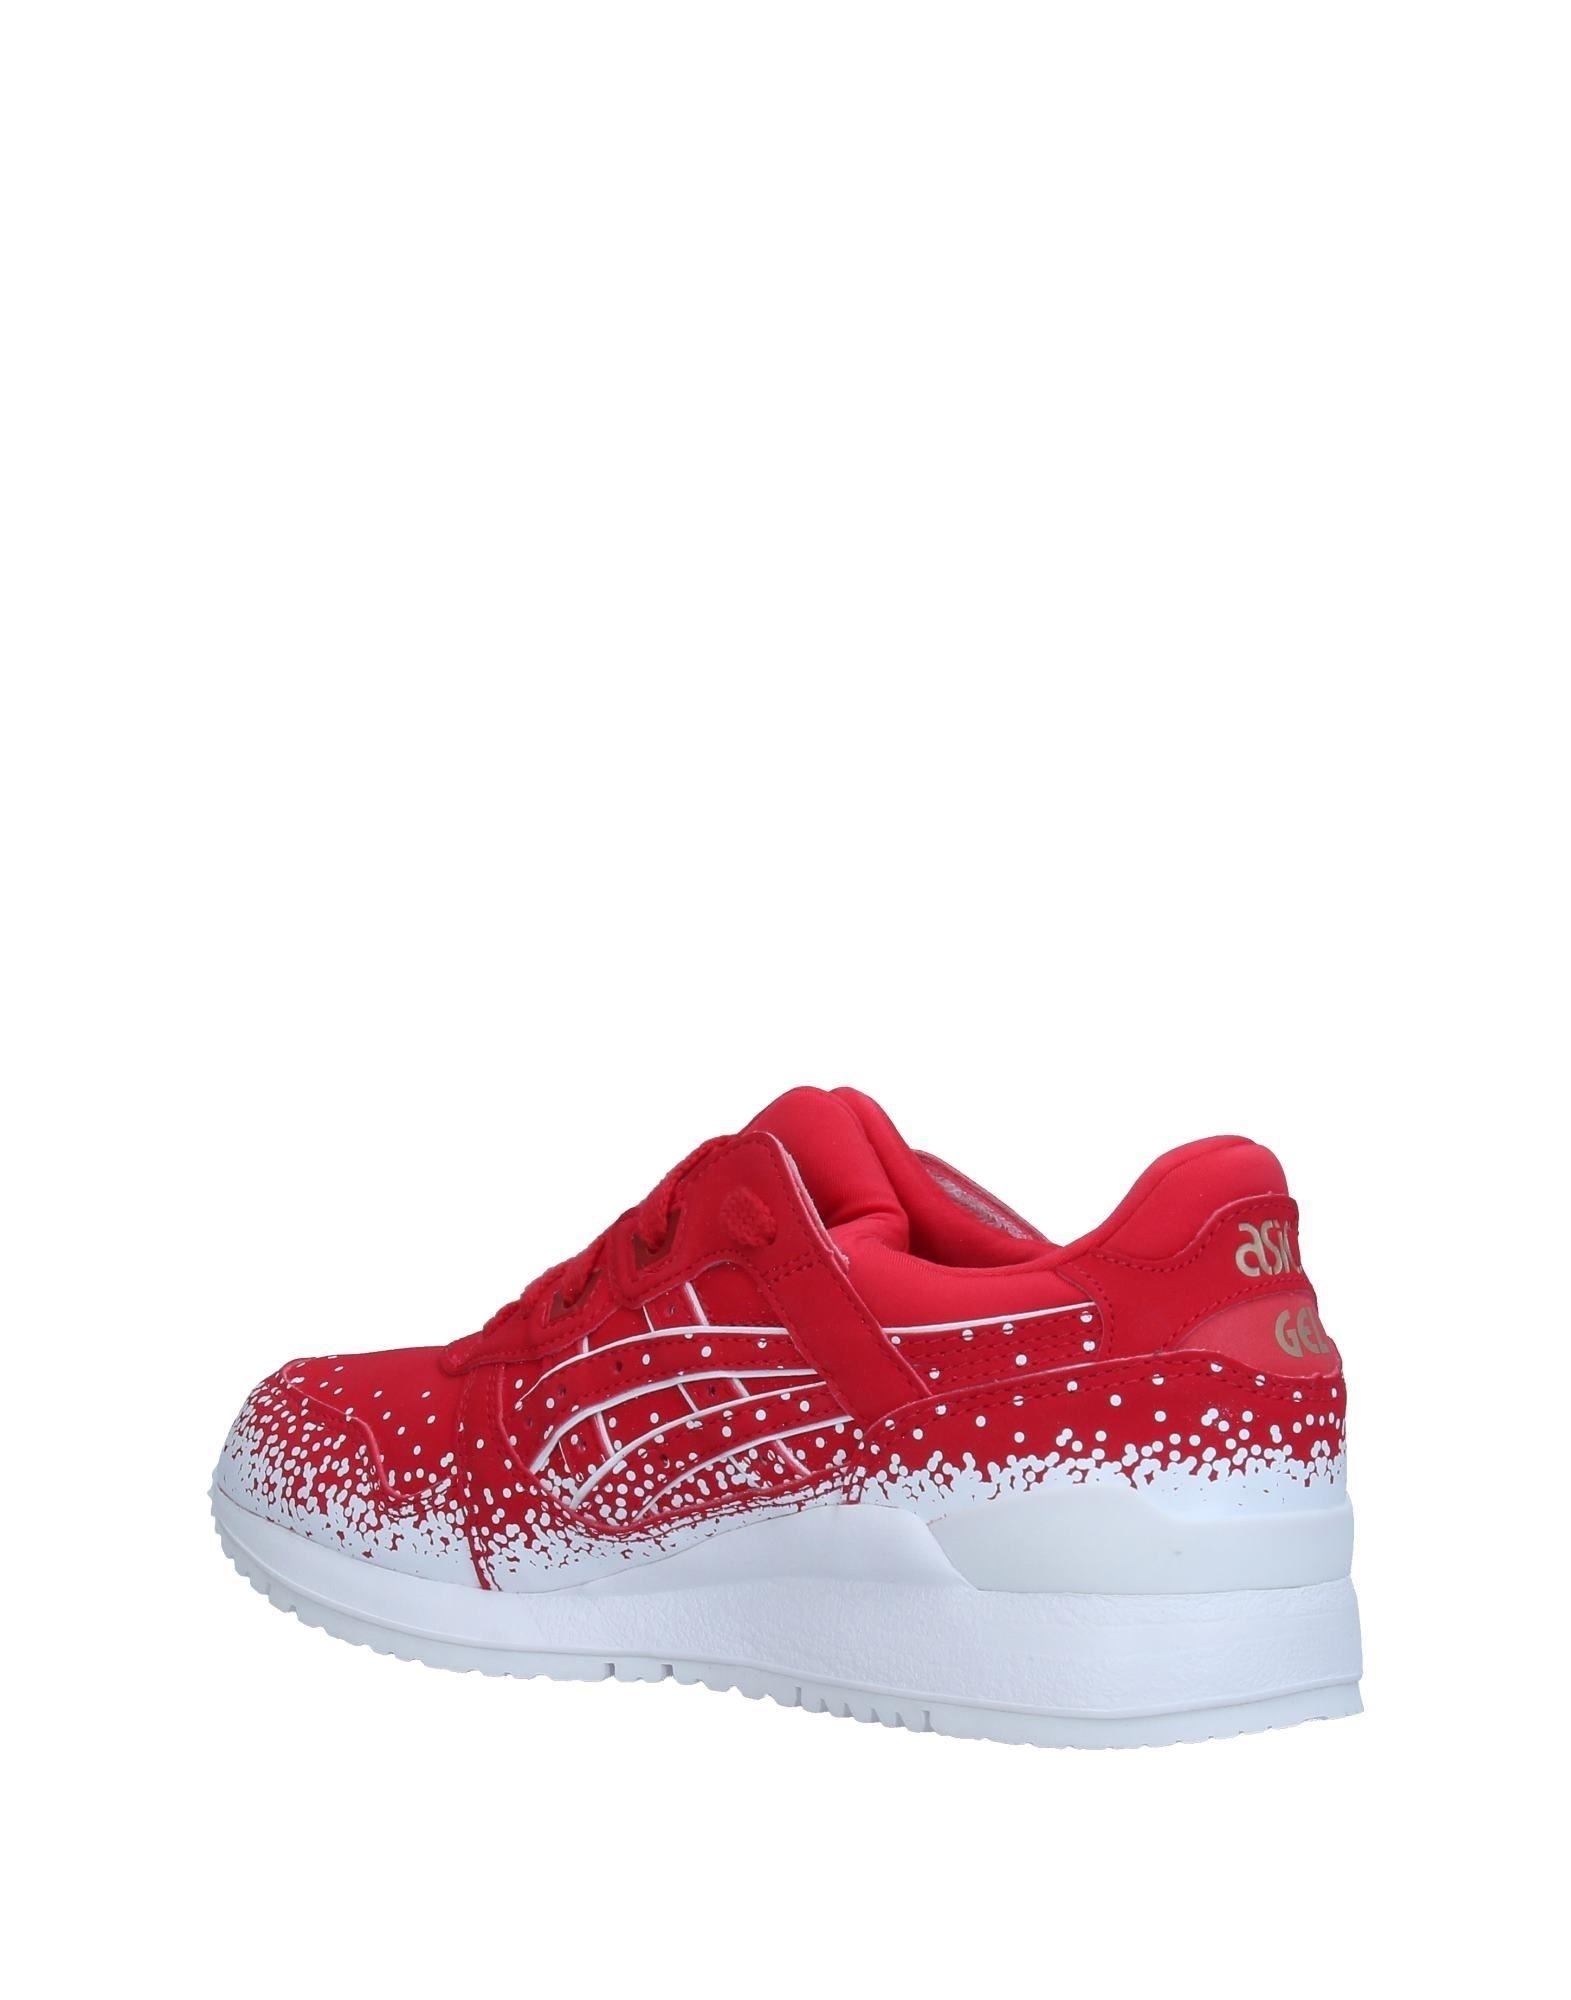 Sneakers Asics Tiger Femme - Sneakers Asics Tiger sur